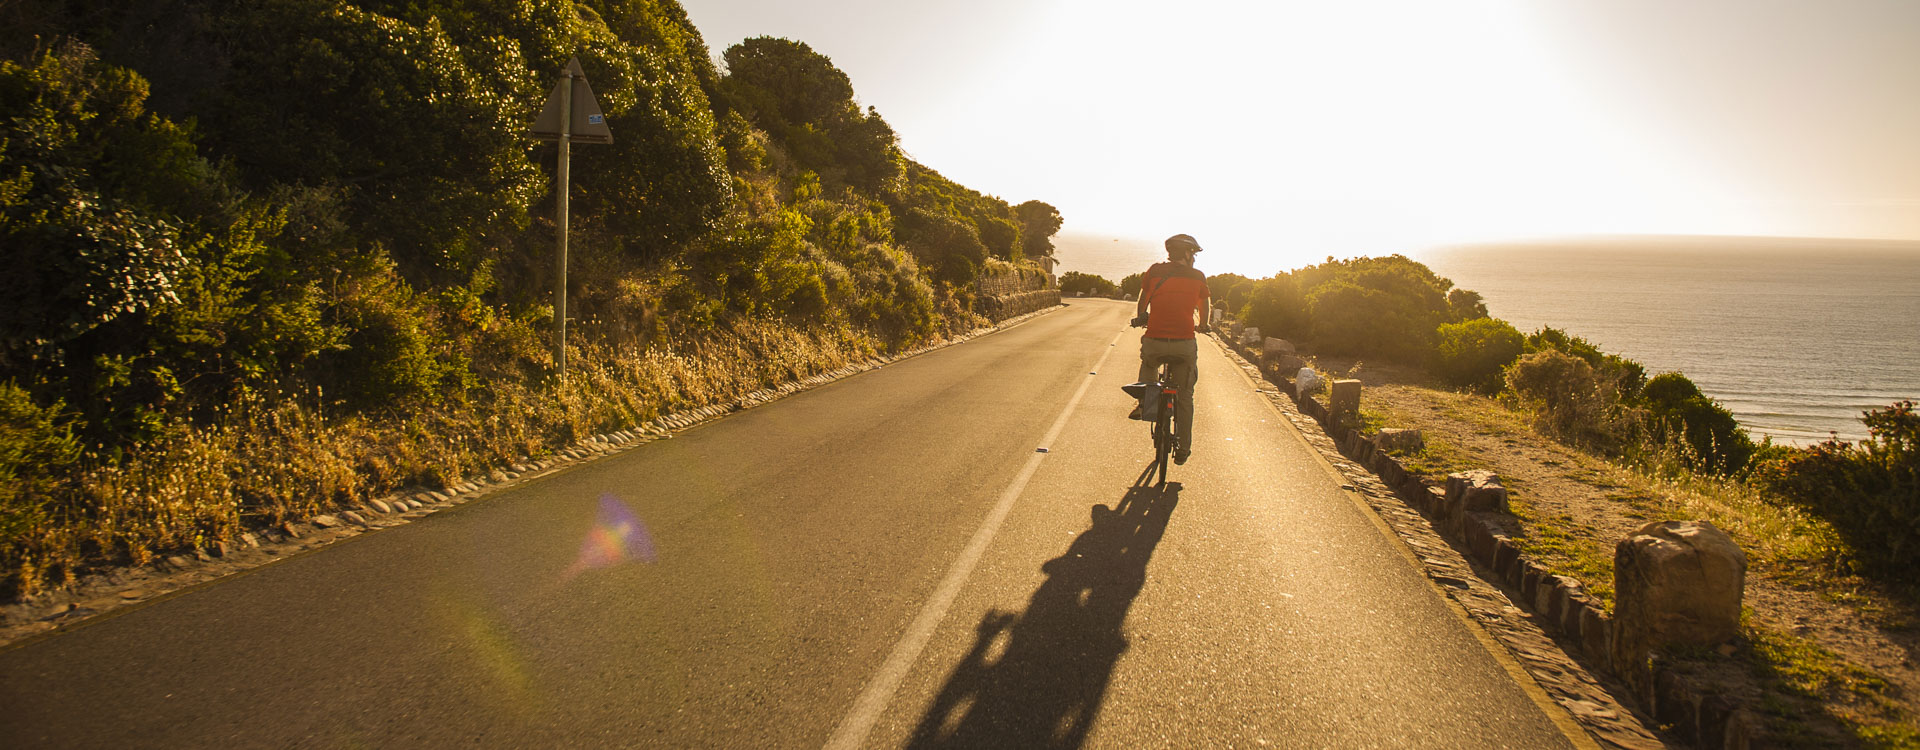 E-Velo-Reise in Südafrika - Radfahren auf der Kap-Halbinsel